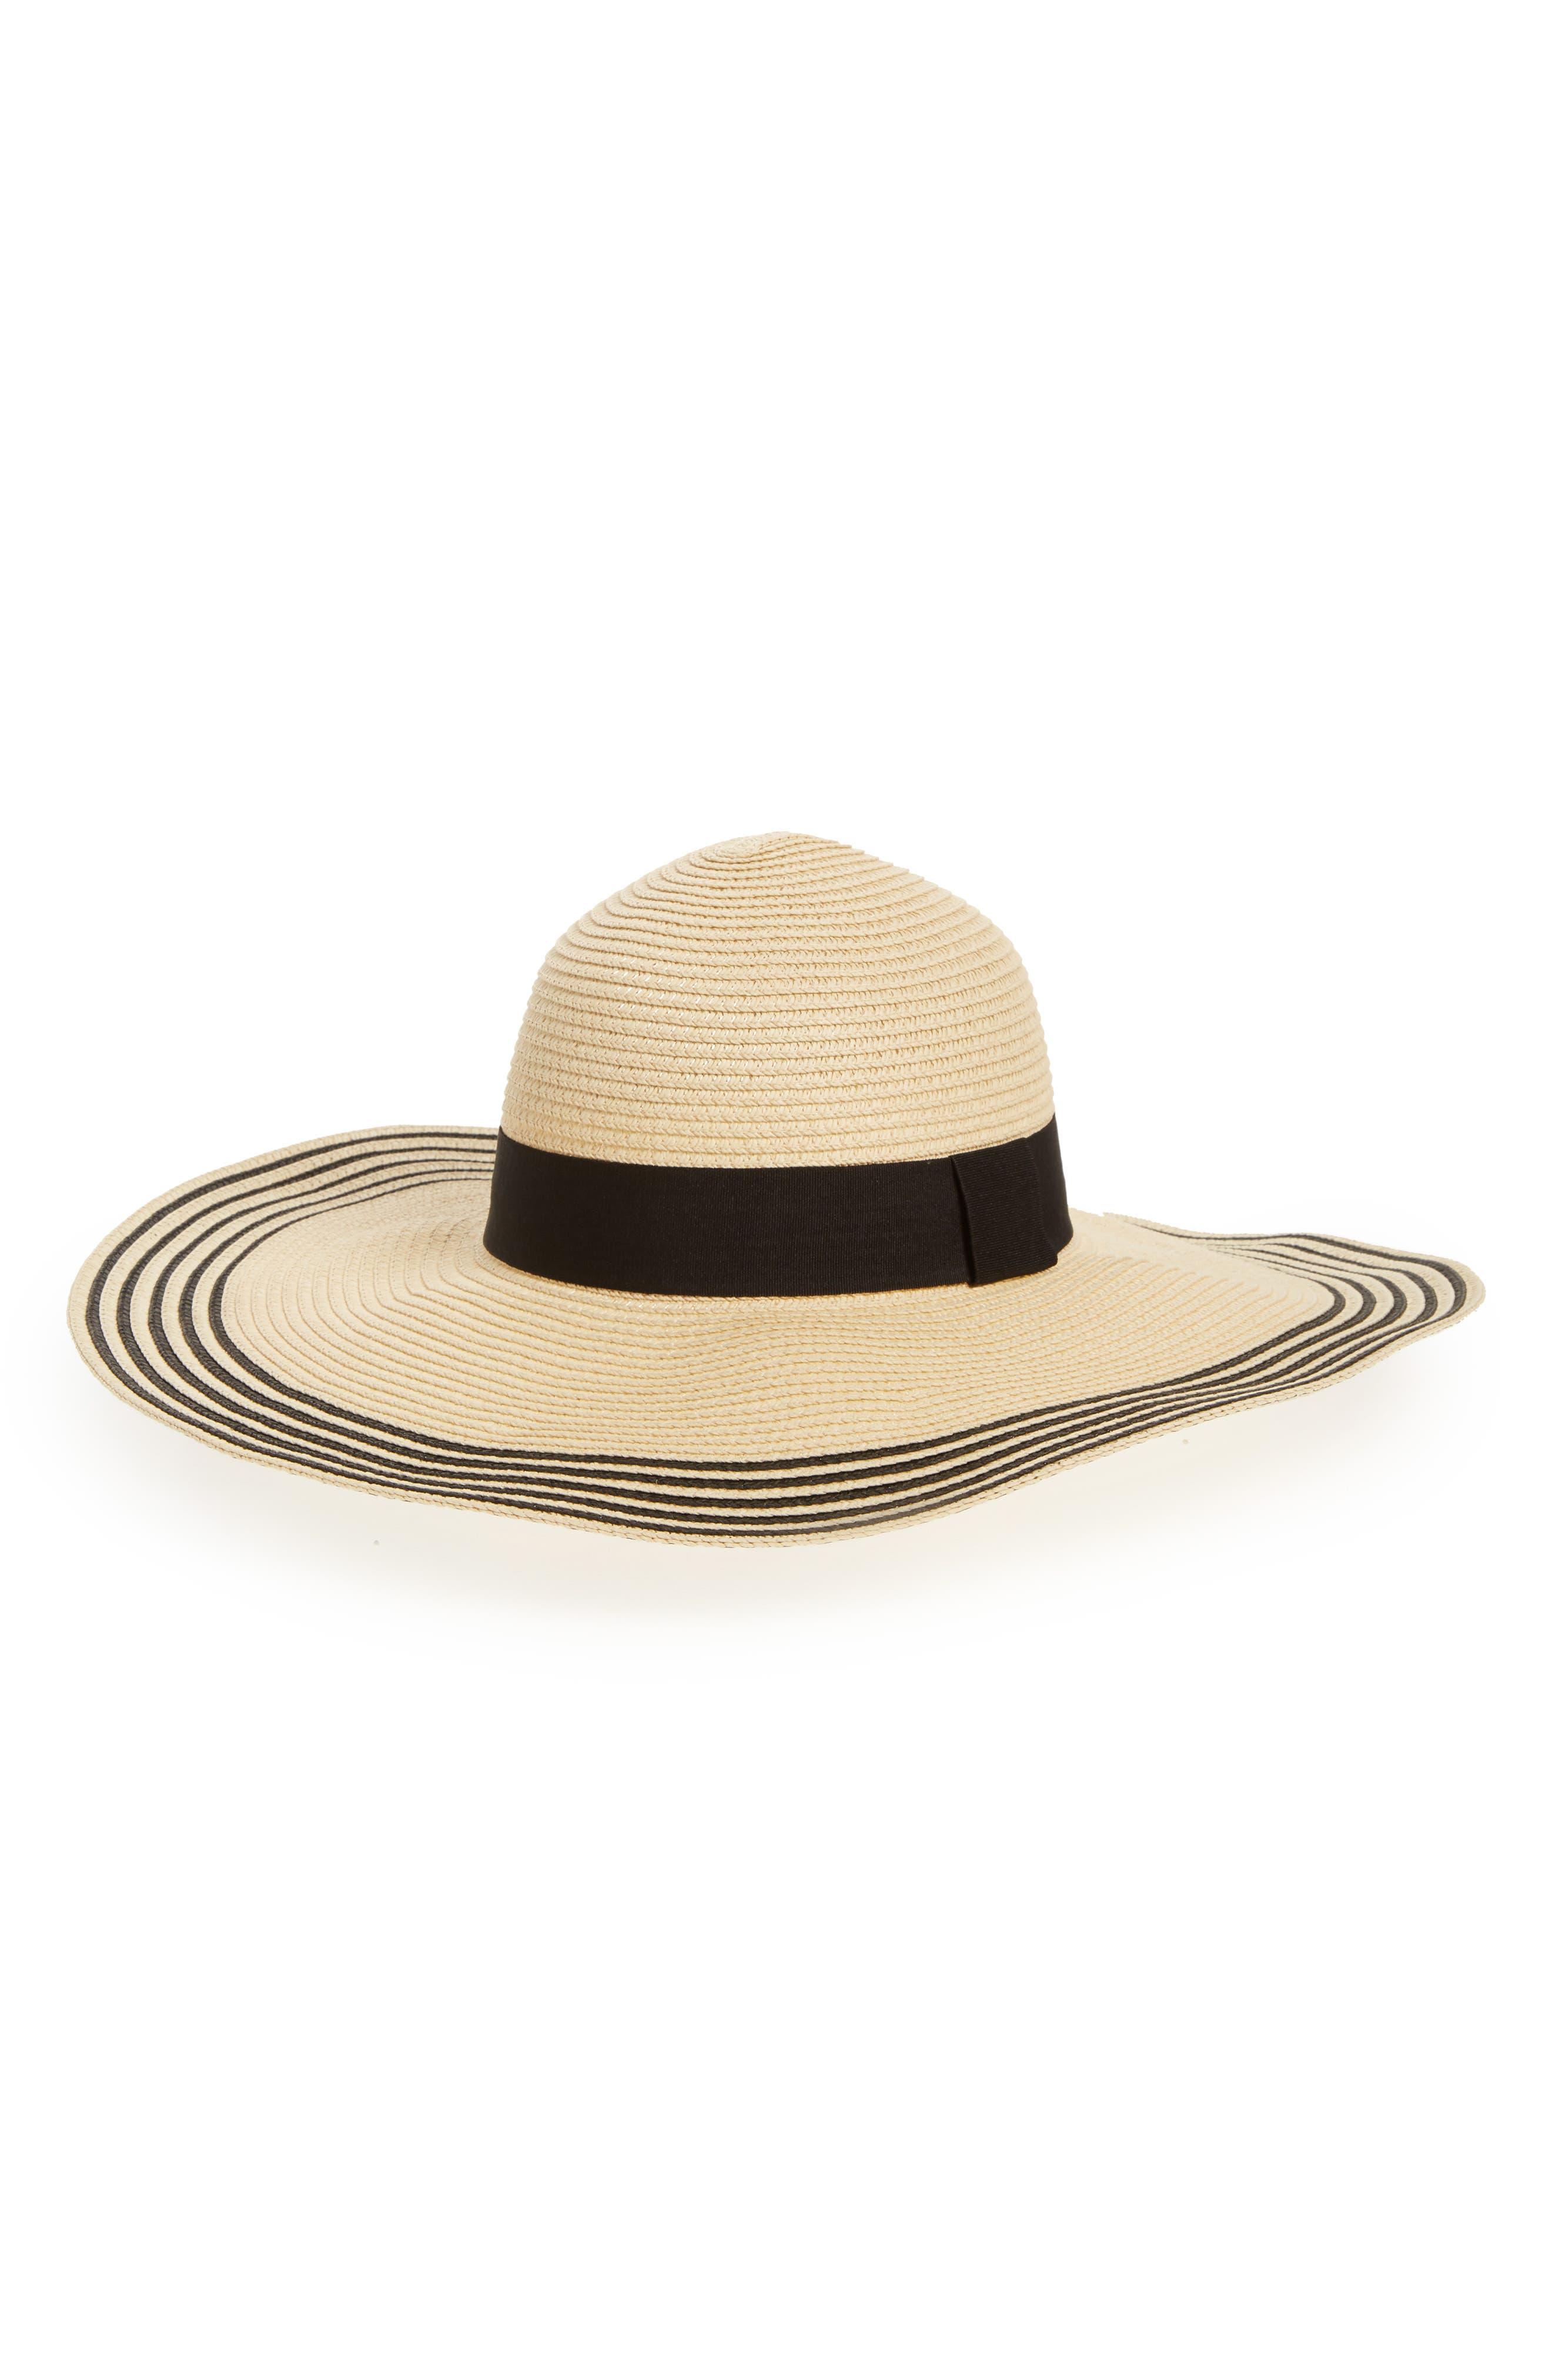 Stripe Brim Straw Hat,                         Main,                         color, Natural/ Black